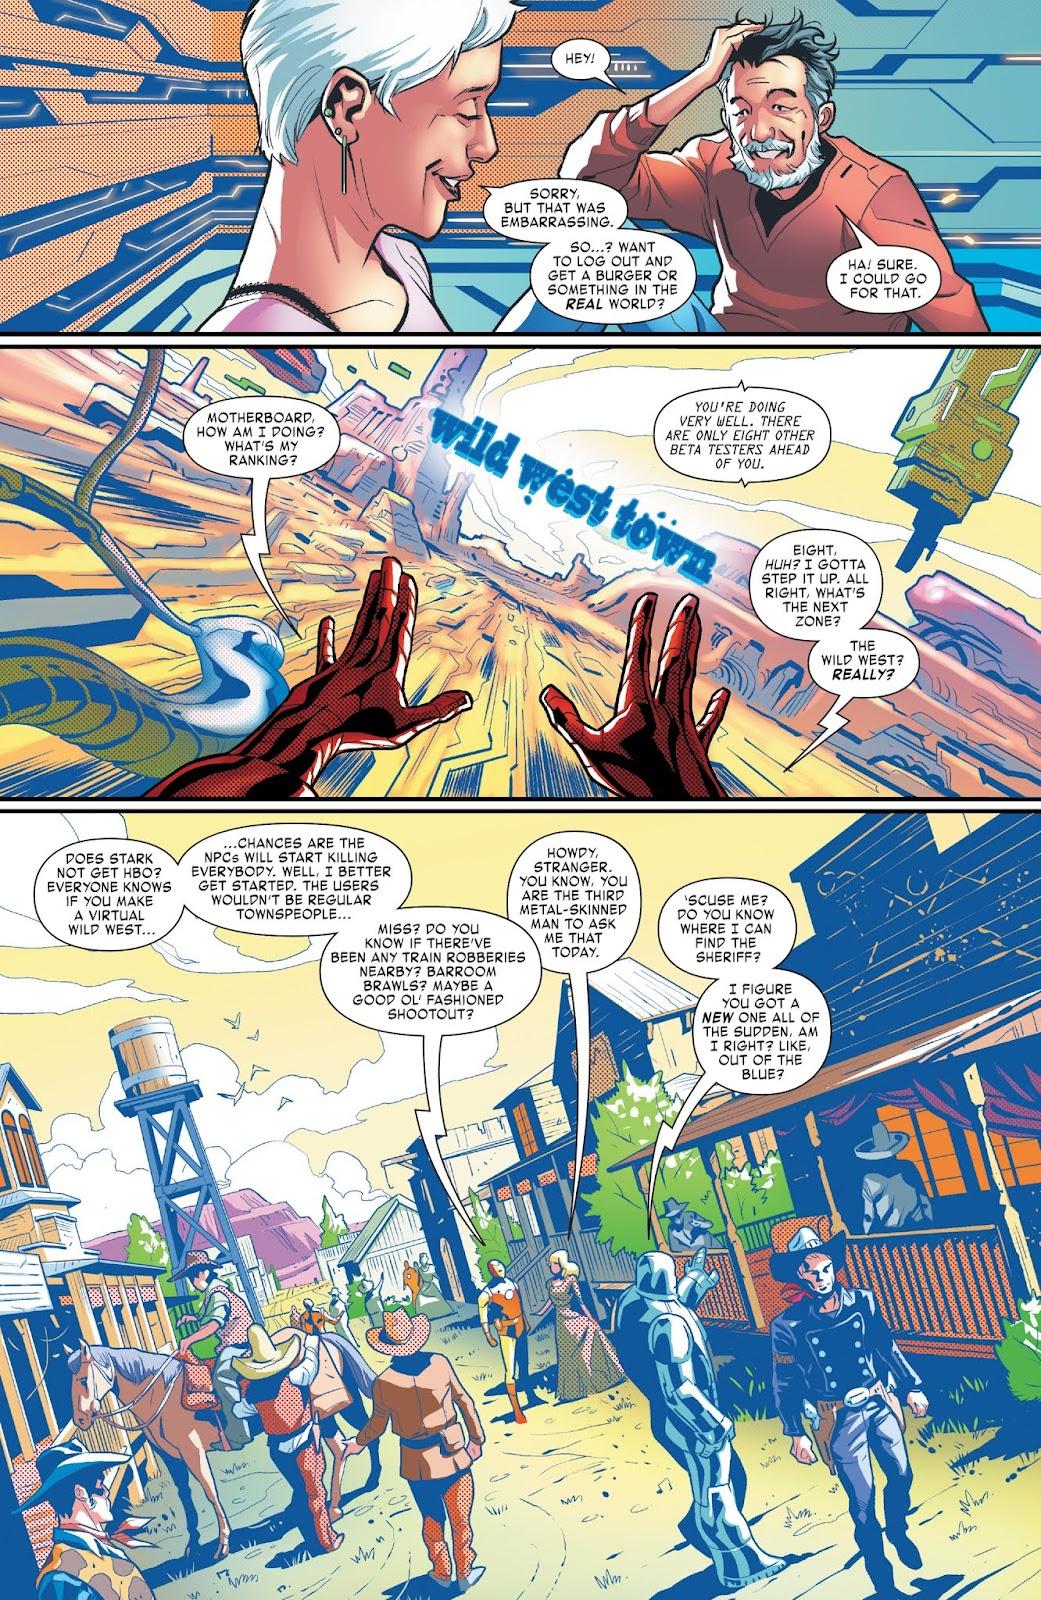 Read online Tony Stark: Iron Man comic -  Issue #3 - 11